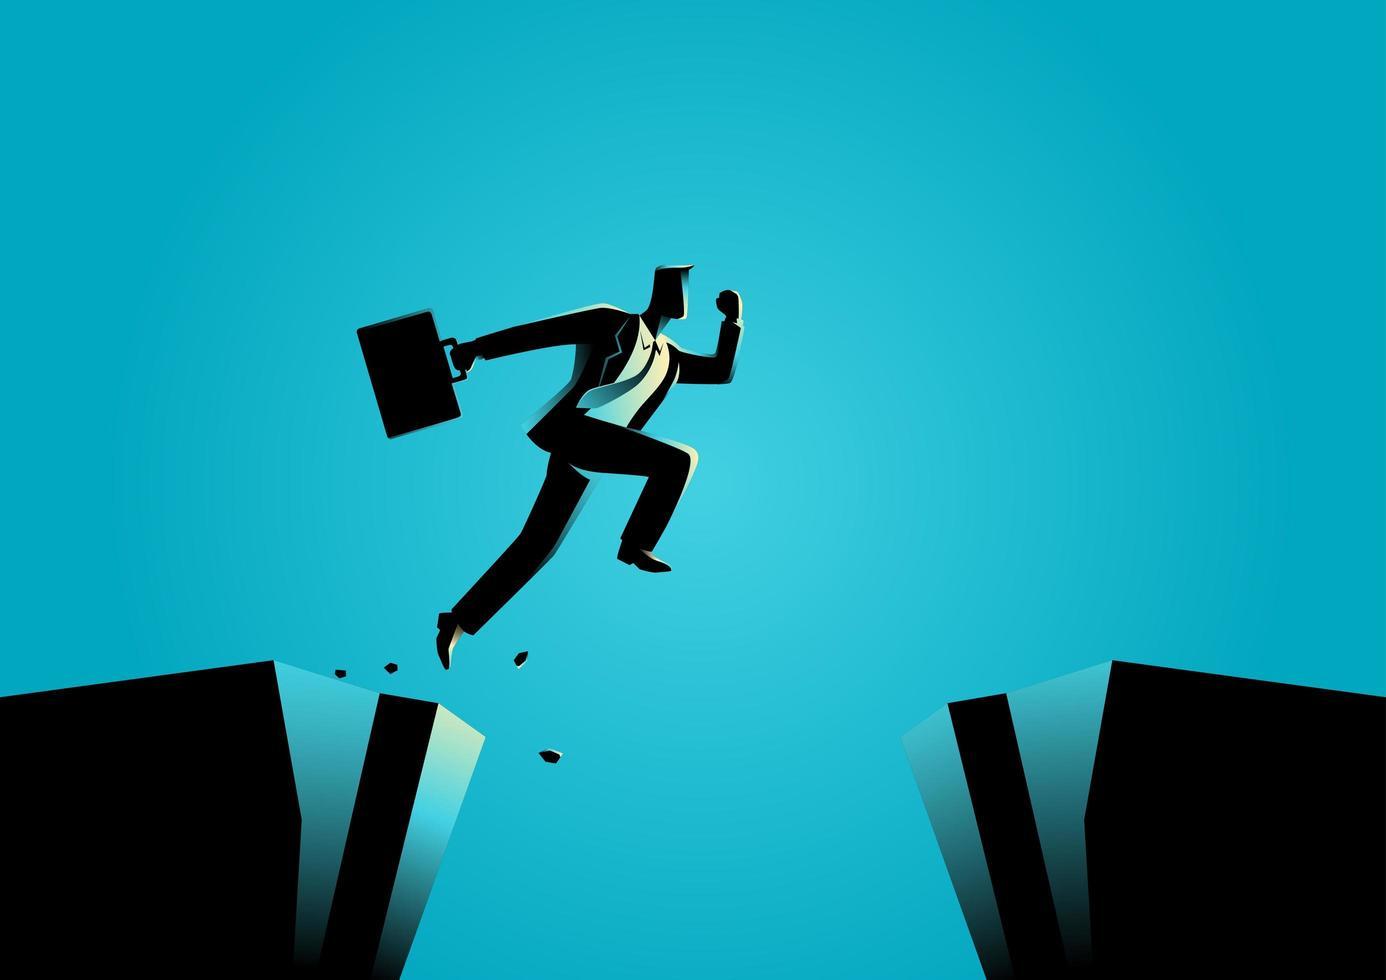 Businessman Silhouette Jumping Ravine vector